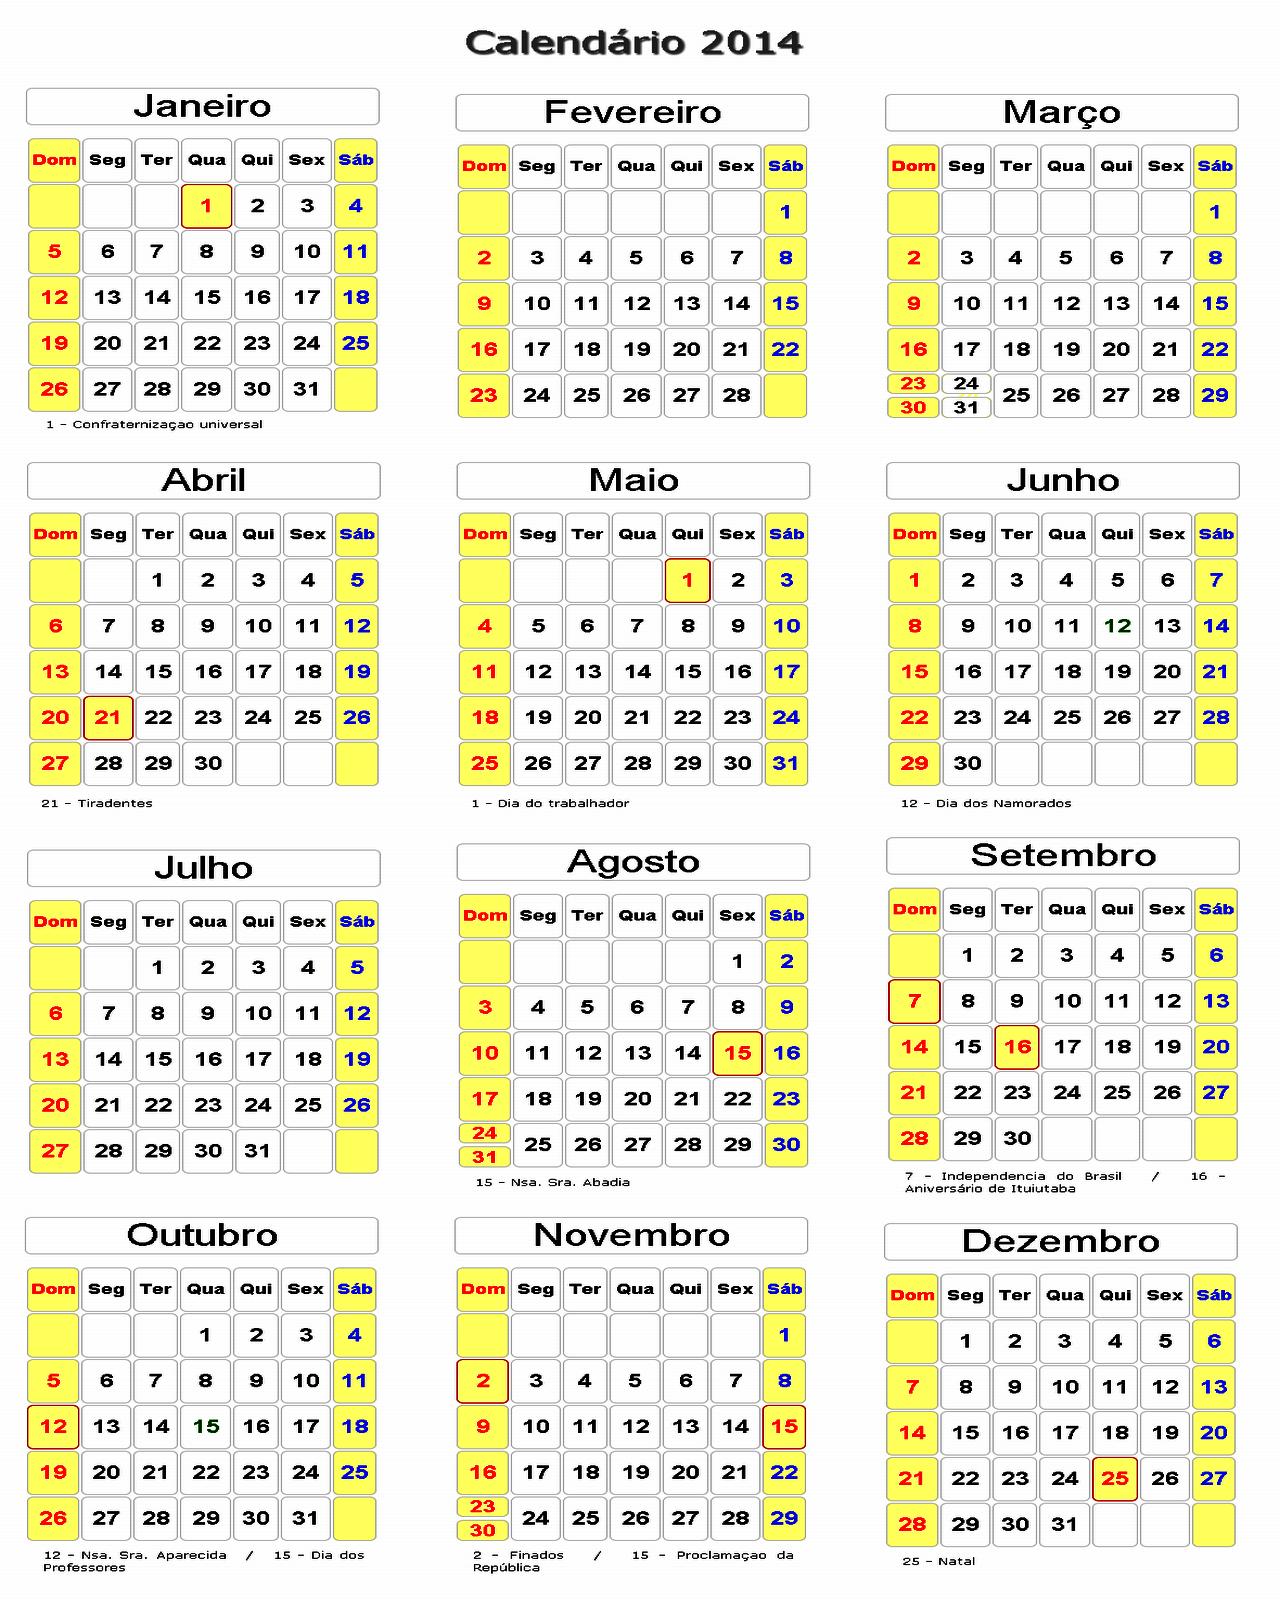 Calendario Para Imprimir Calendario 2014 Page 3 | Share The Knownledge